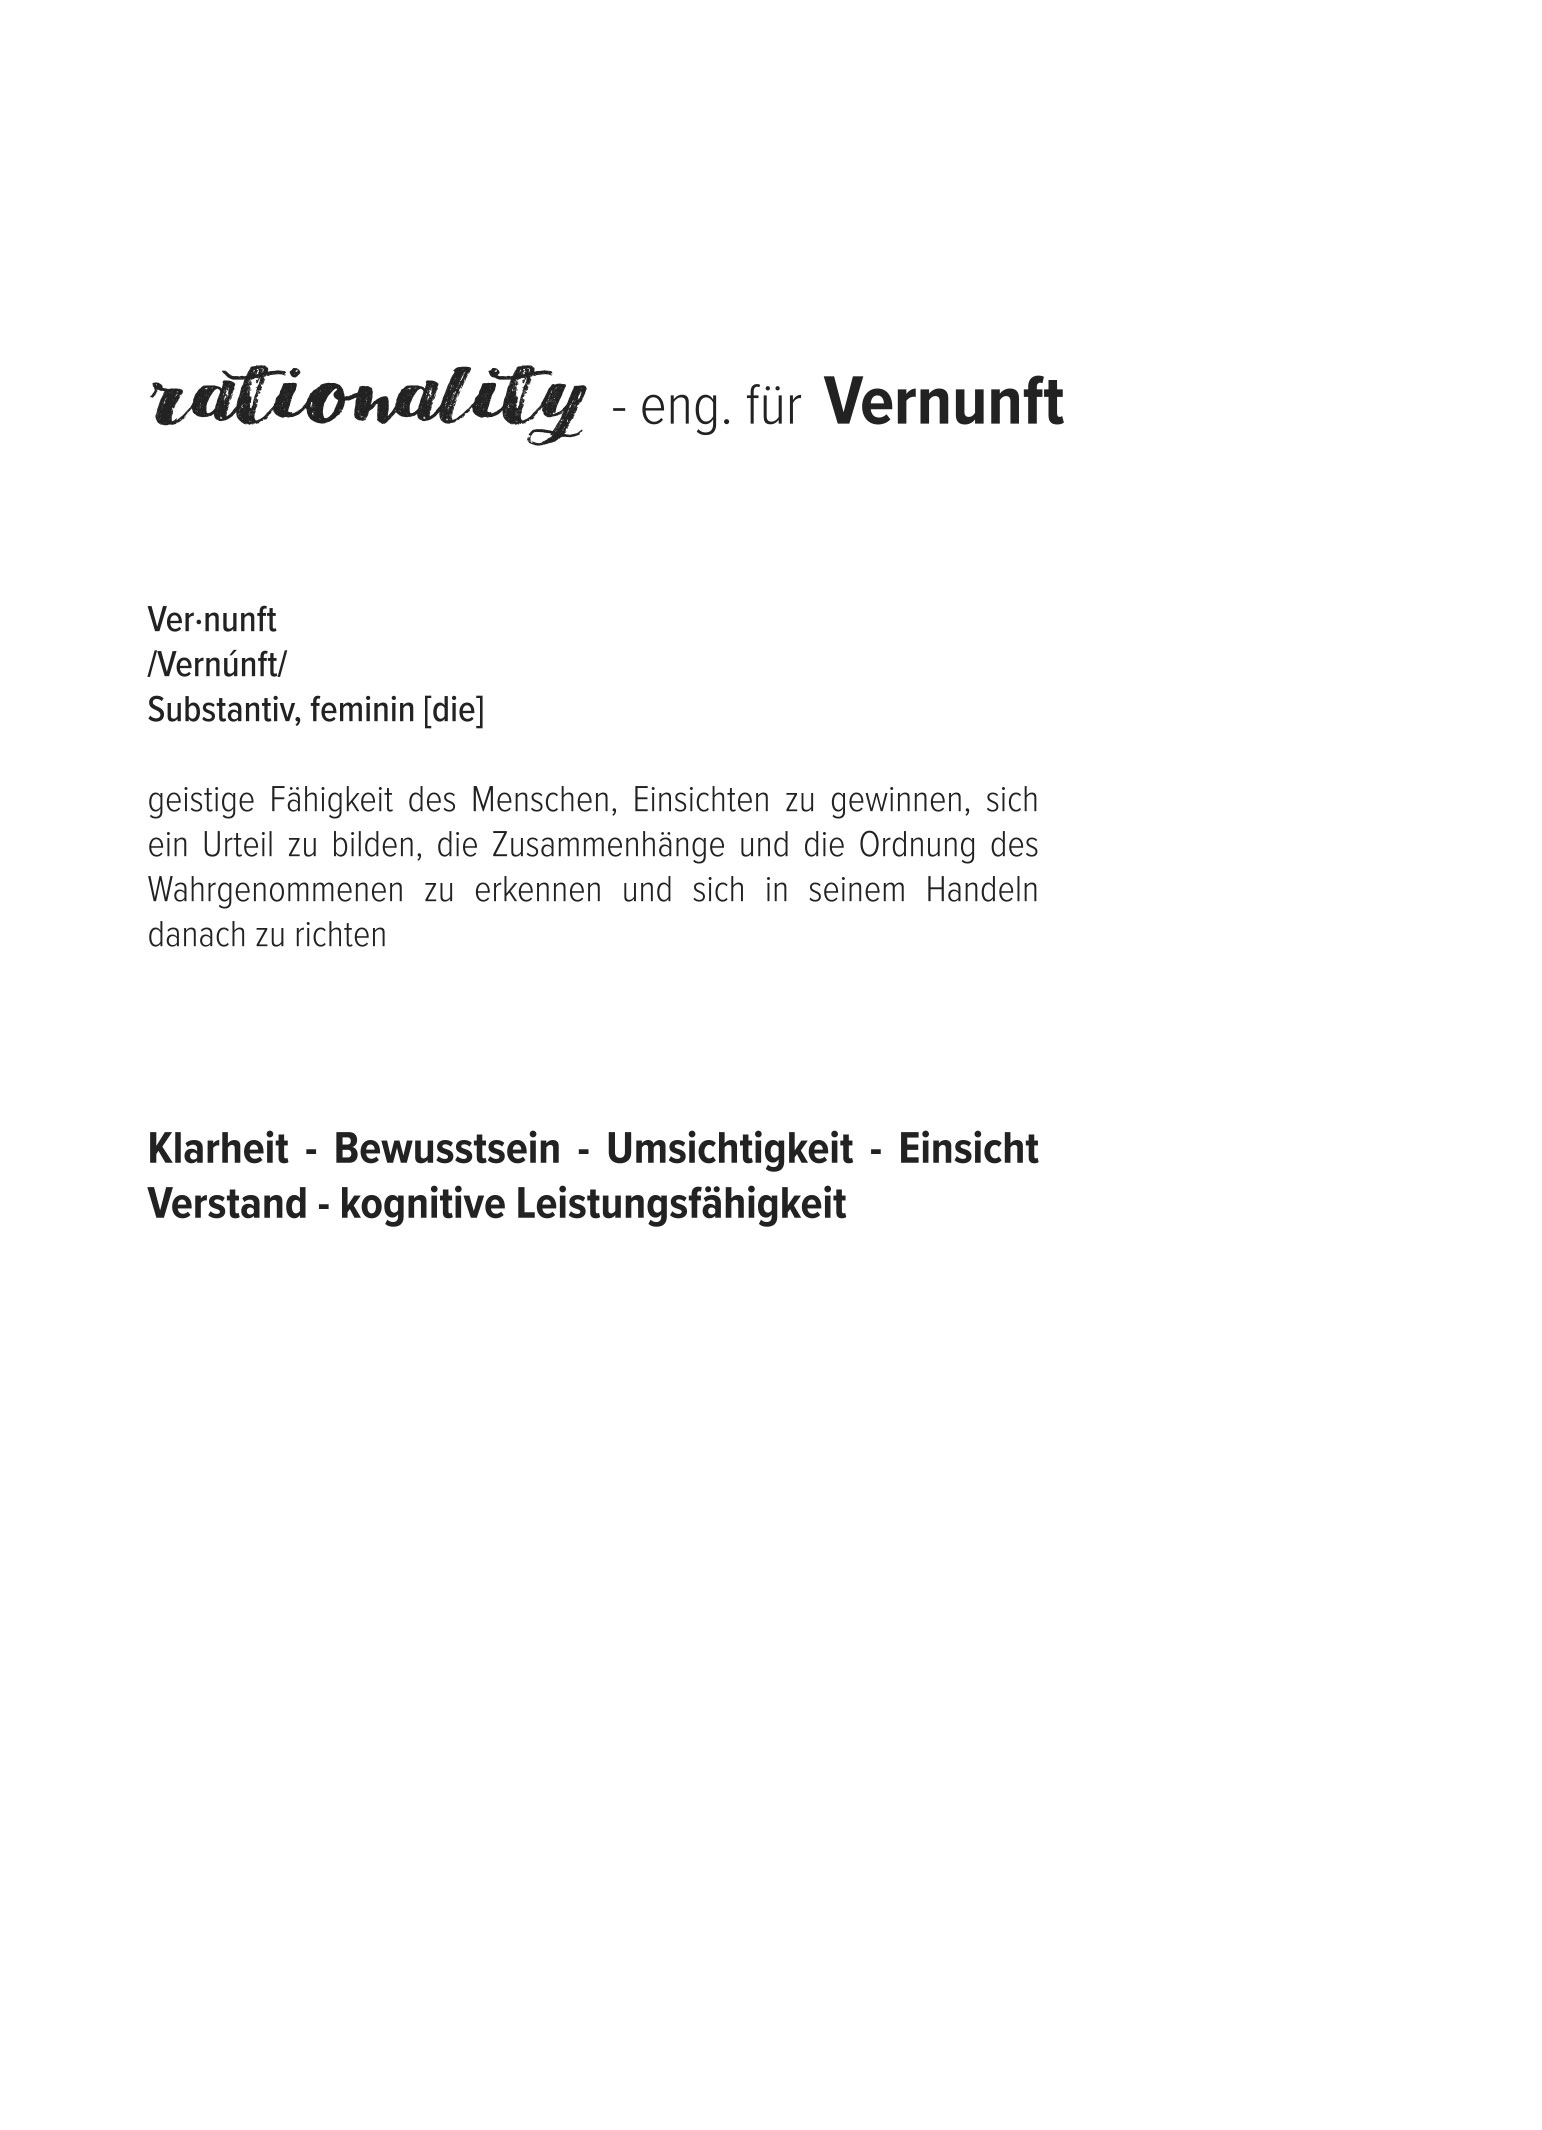 08_rationality-2.jpg